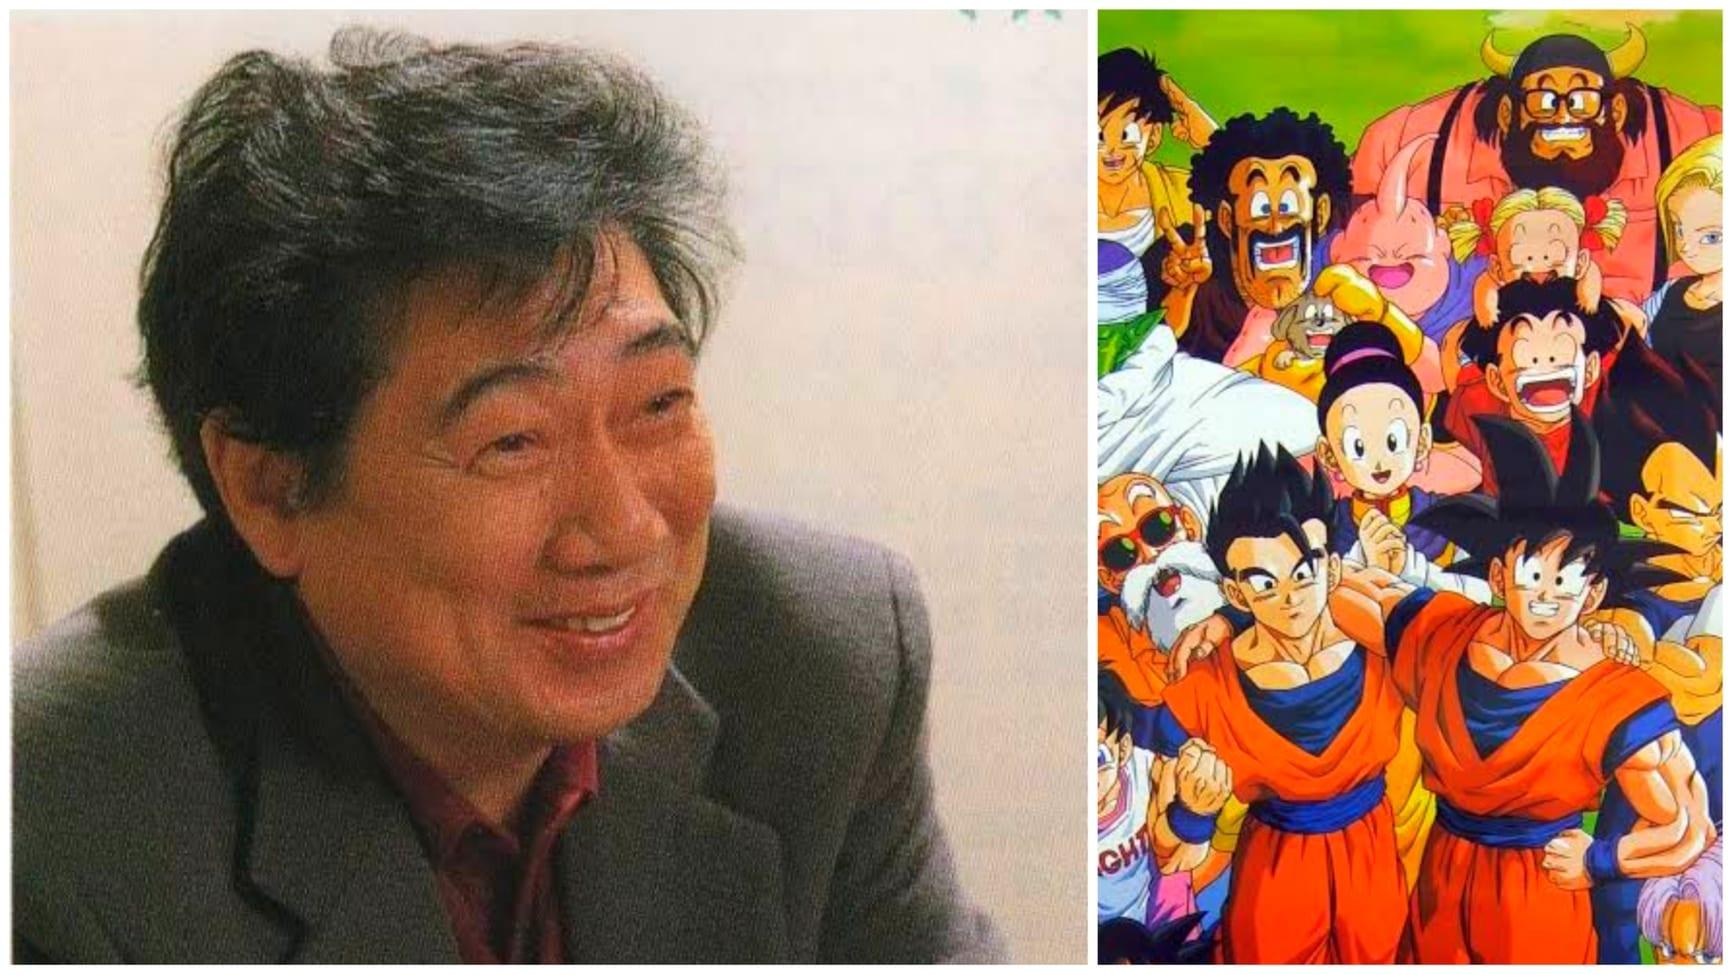 Shunsuke Kikuchi passed away at 89